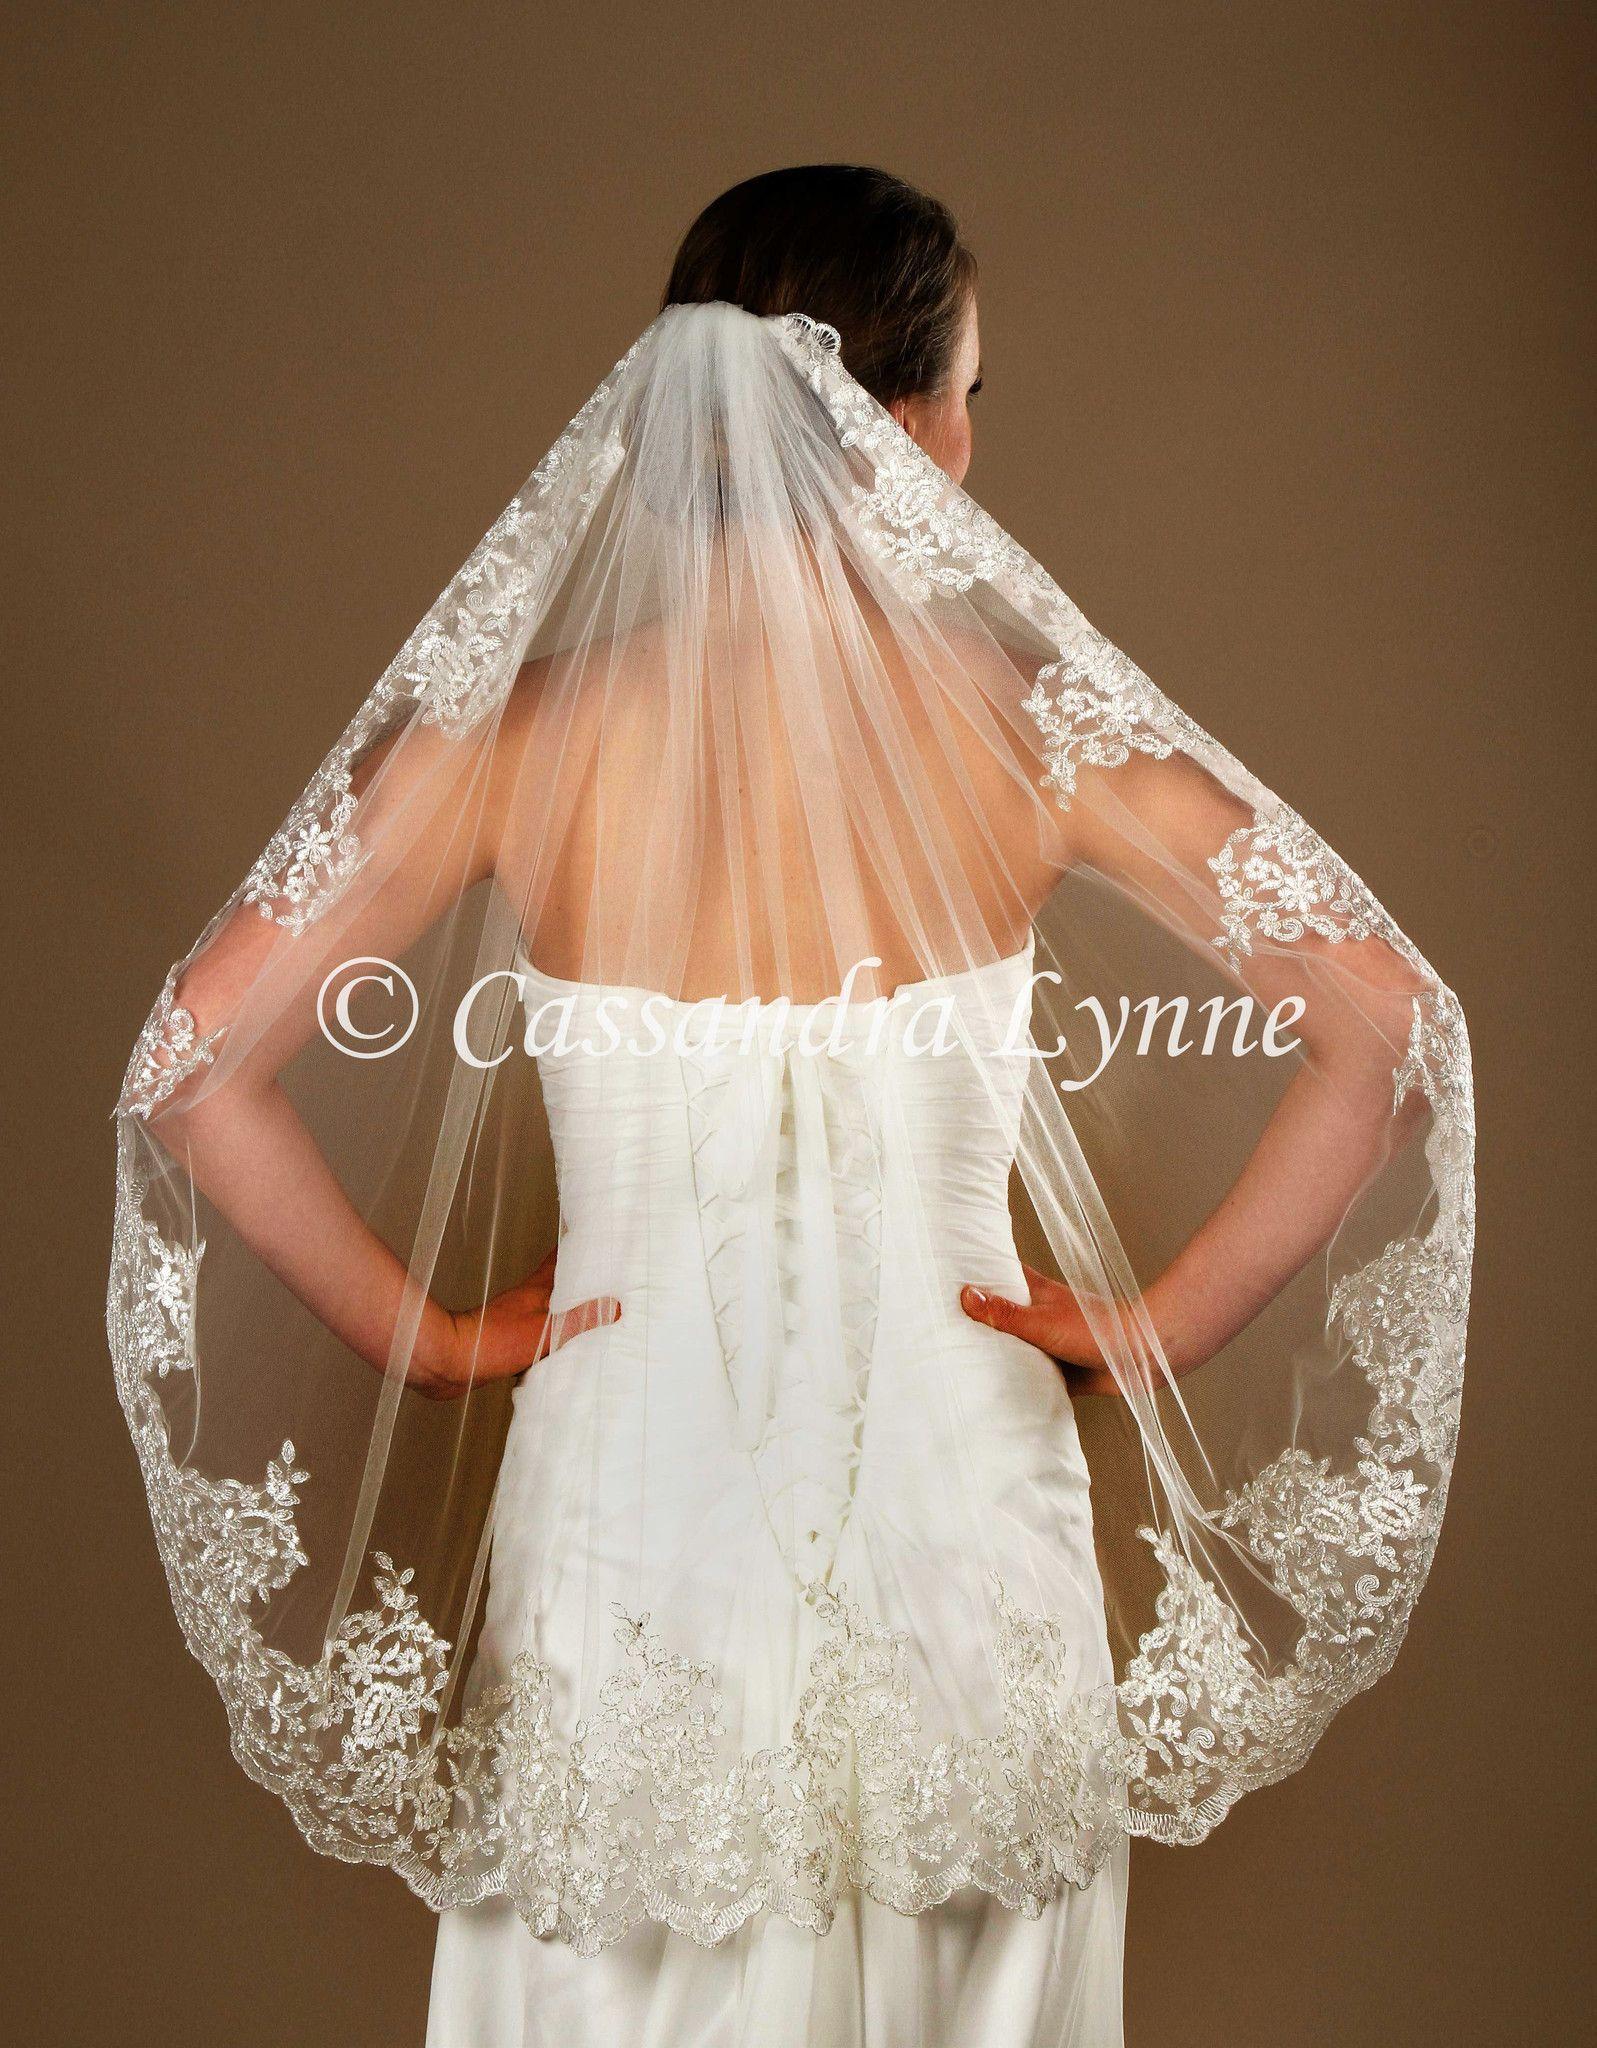 Wedding Veil Of Dramatic Lace Fingertip Length In 2021 Wedding Veils Short Lace Veils Bridal Wedding Veils Lace [ 2048 x 1597 Pixel ]